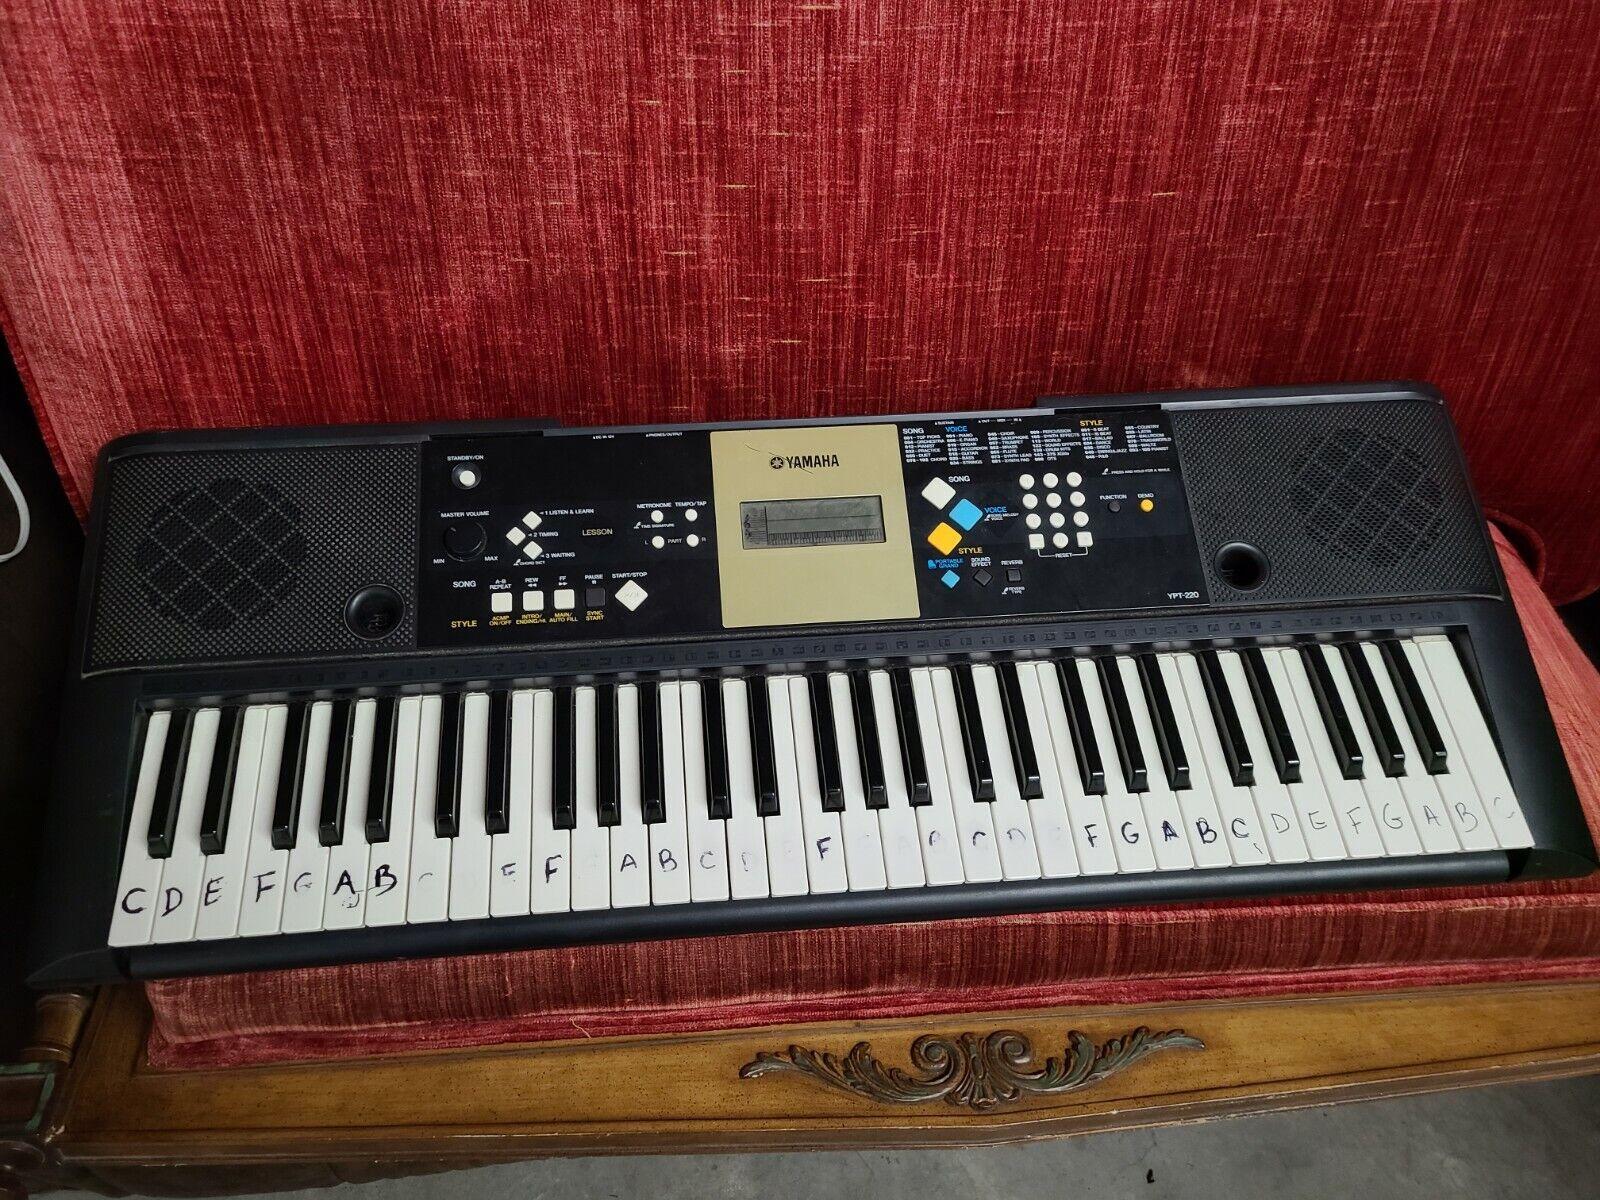 Yamaha Ypt 220 Keyboard For Sale Online Ebay